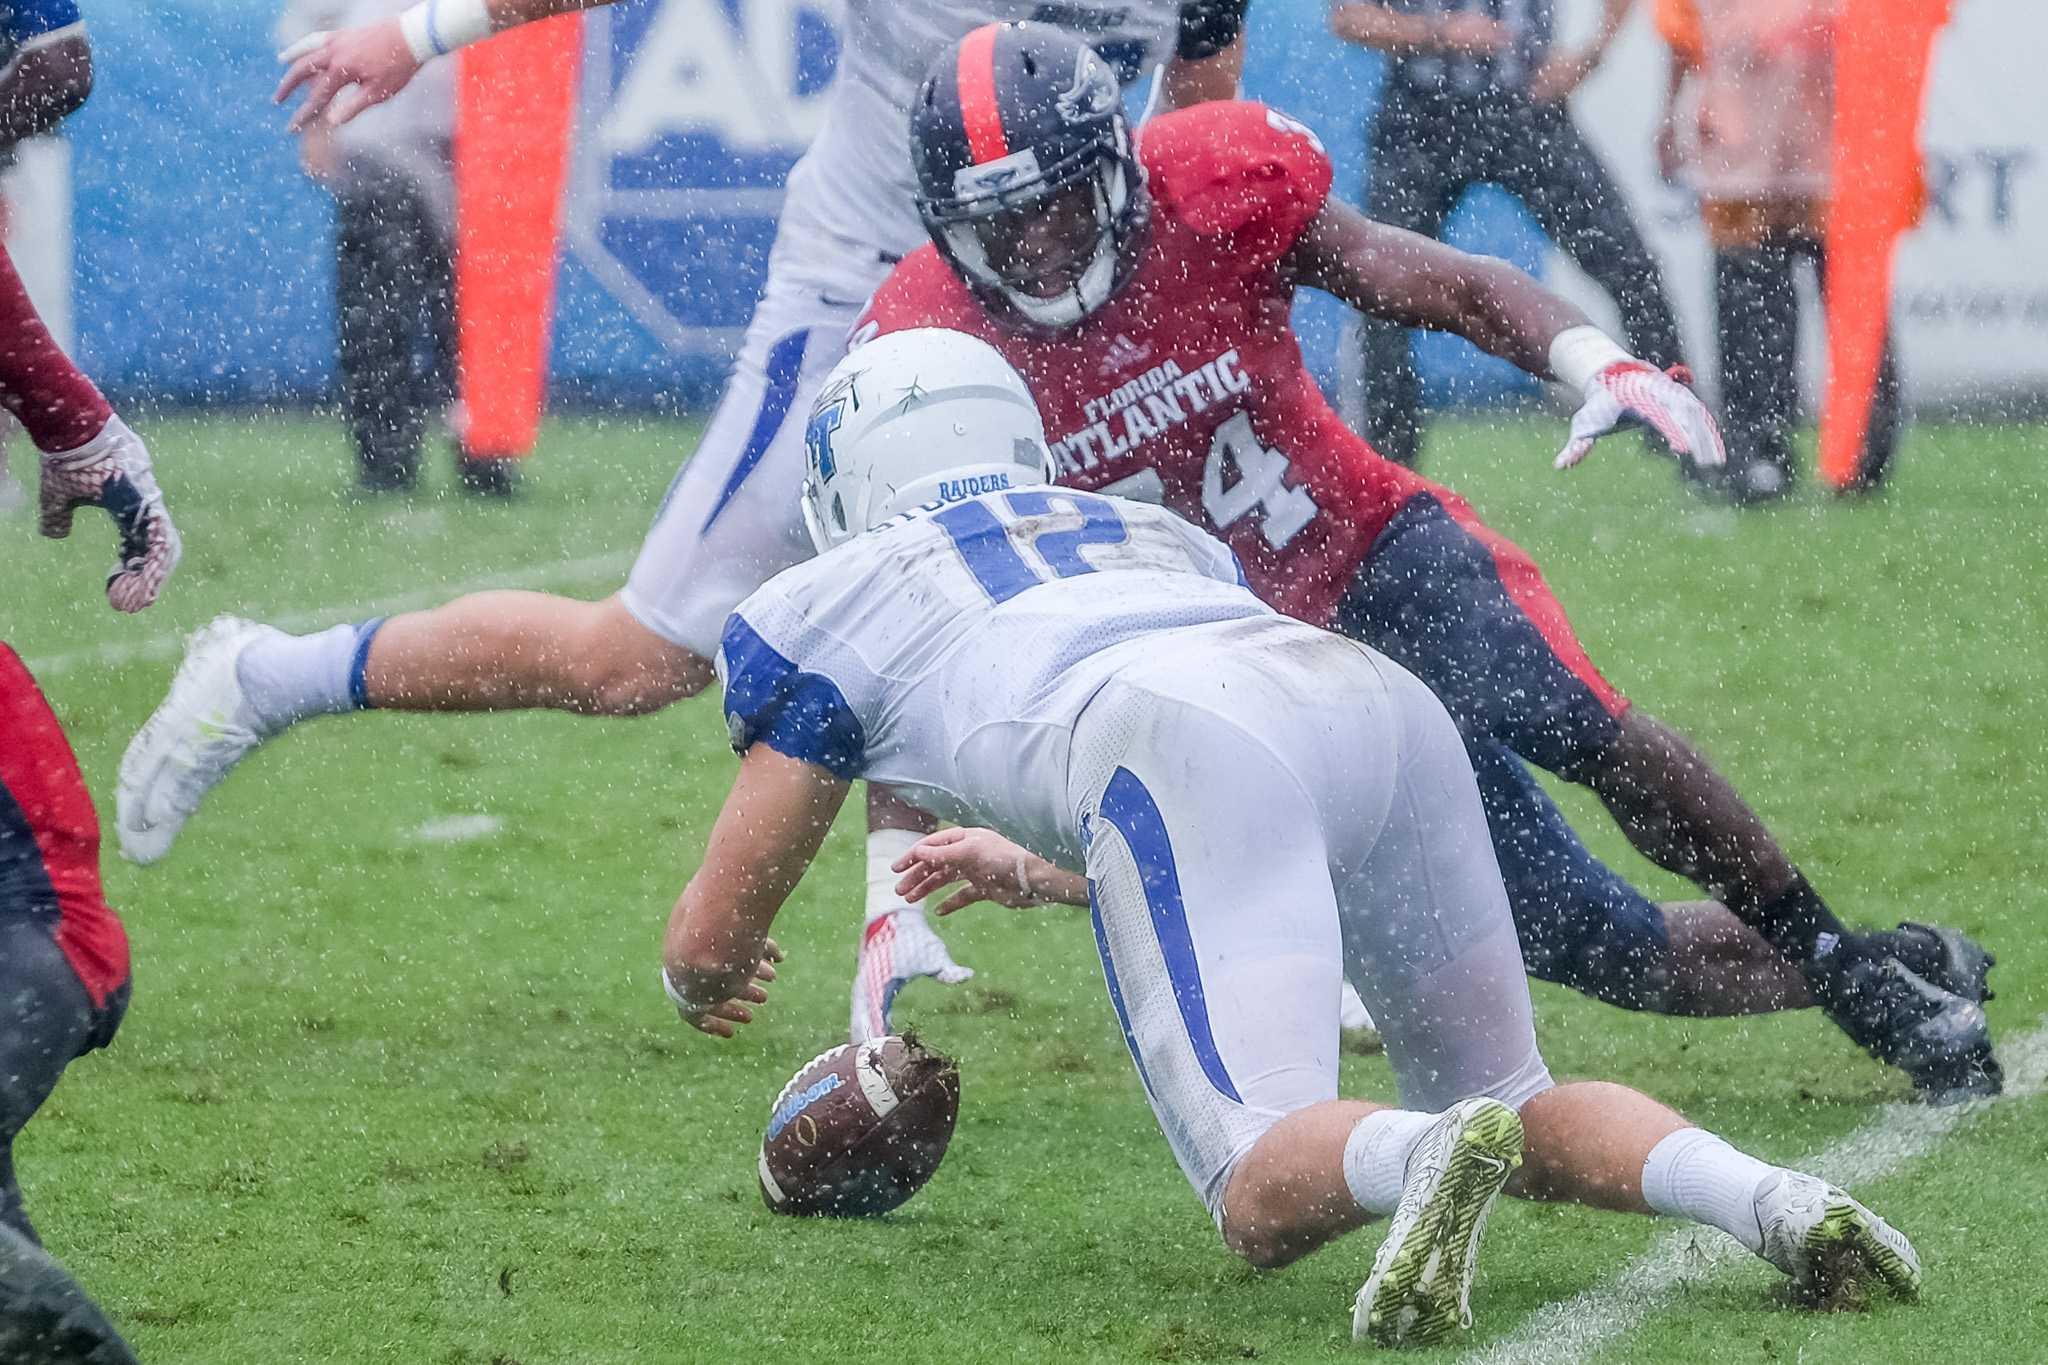 UPWEB_FAU Football vs Middle Tennessee 2015_ Mohammed Emran-6940